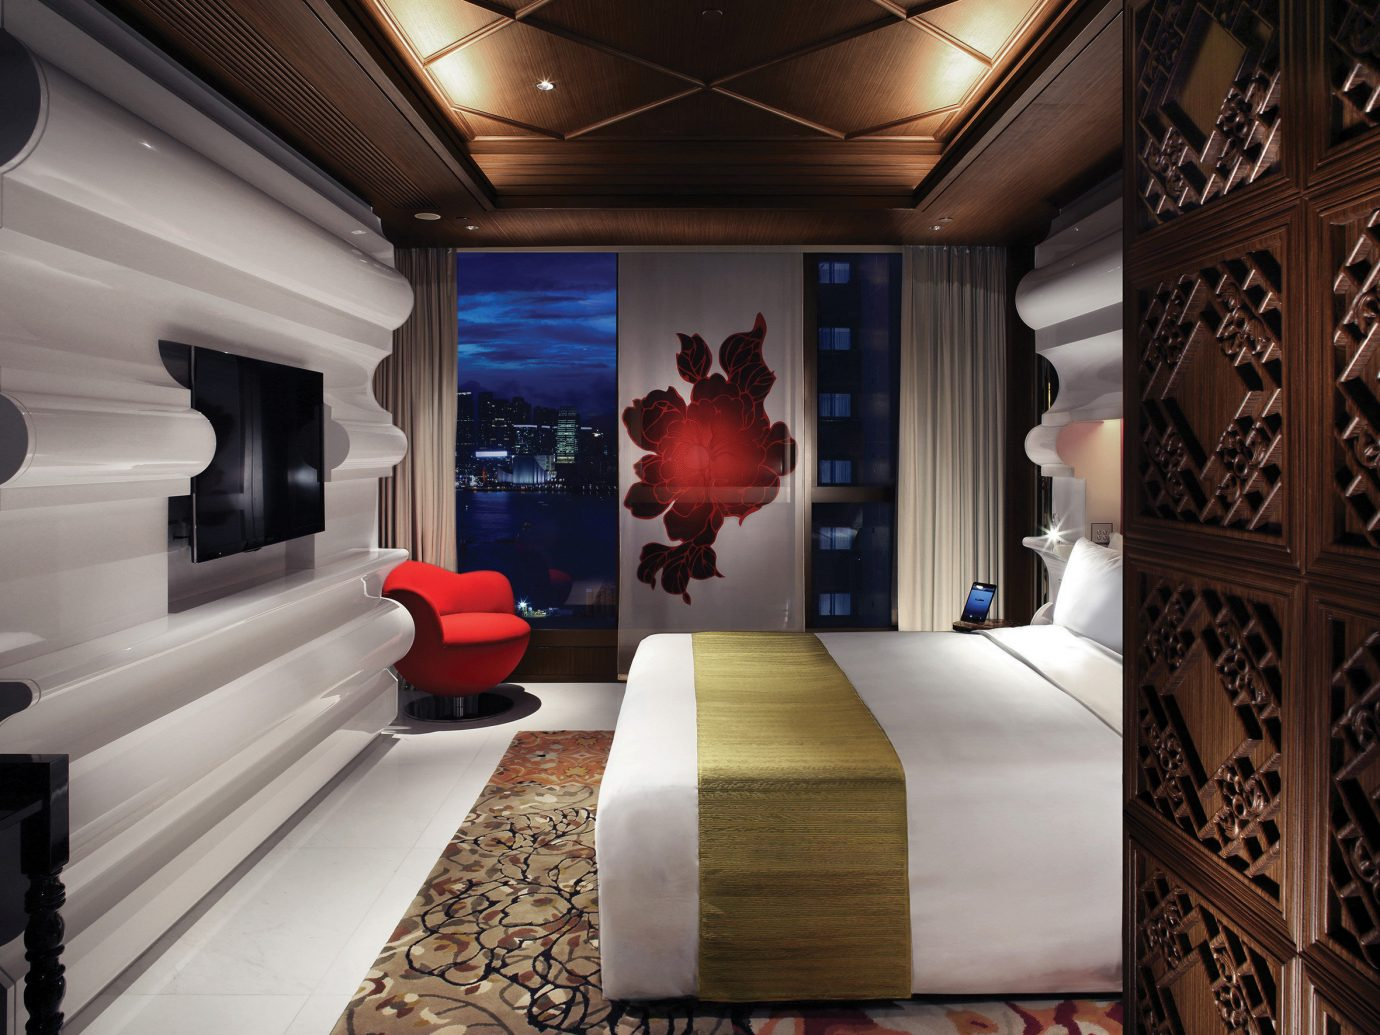 Hotels indoor ceiling room interior design living room Lobby home Suite Design estate mansion furniture